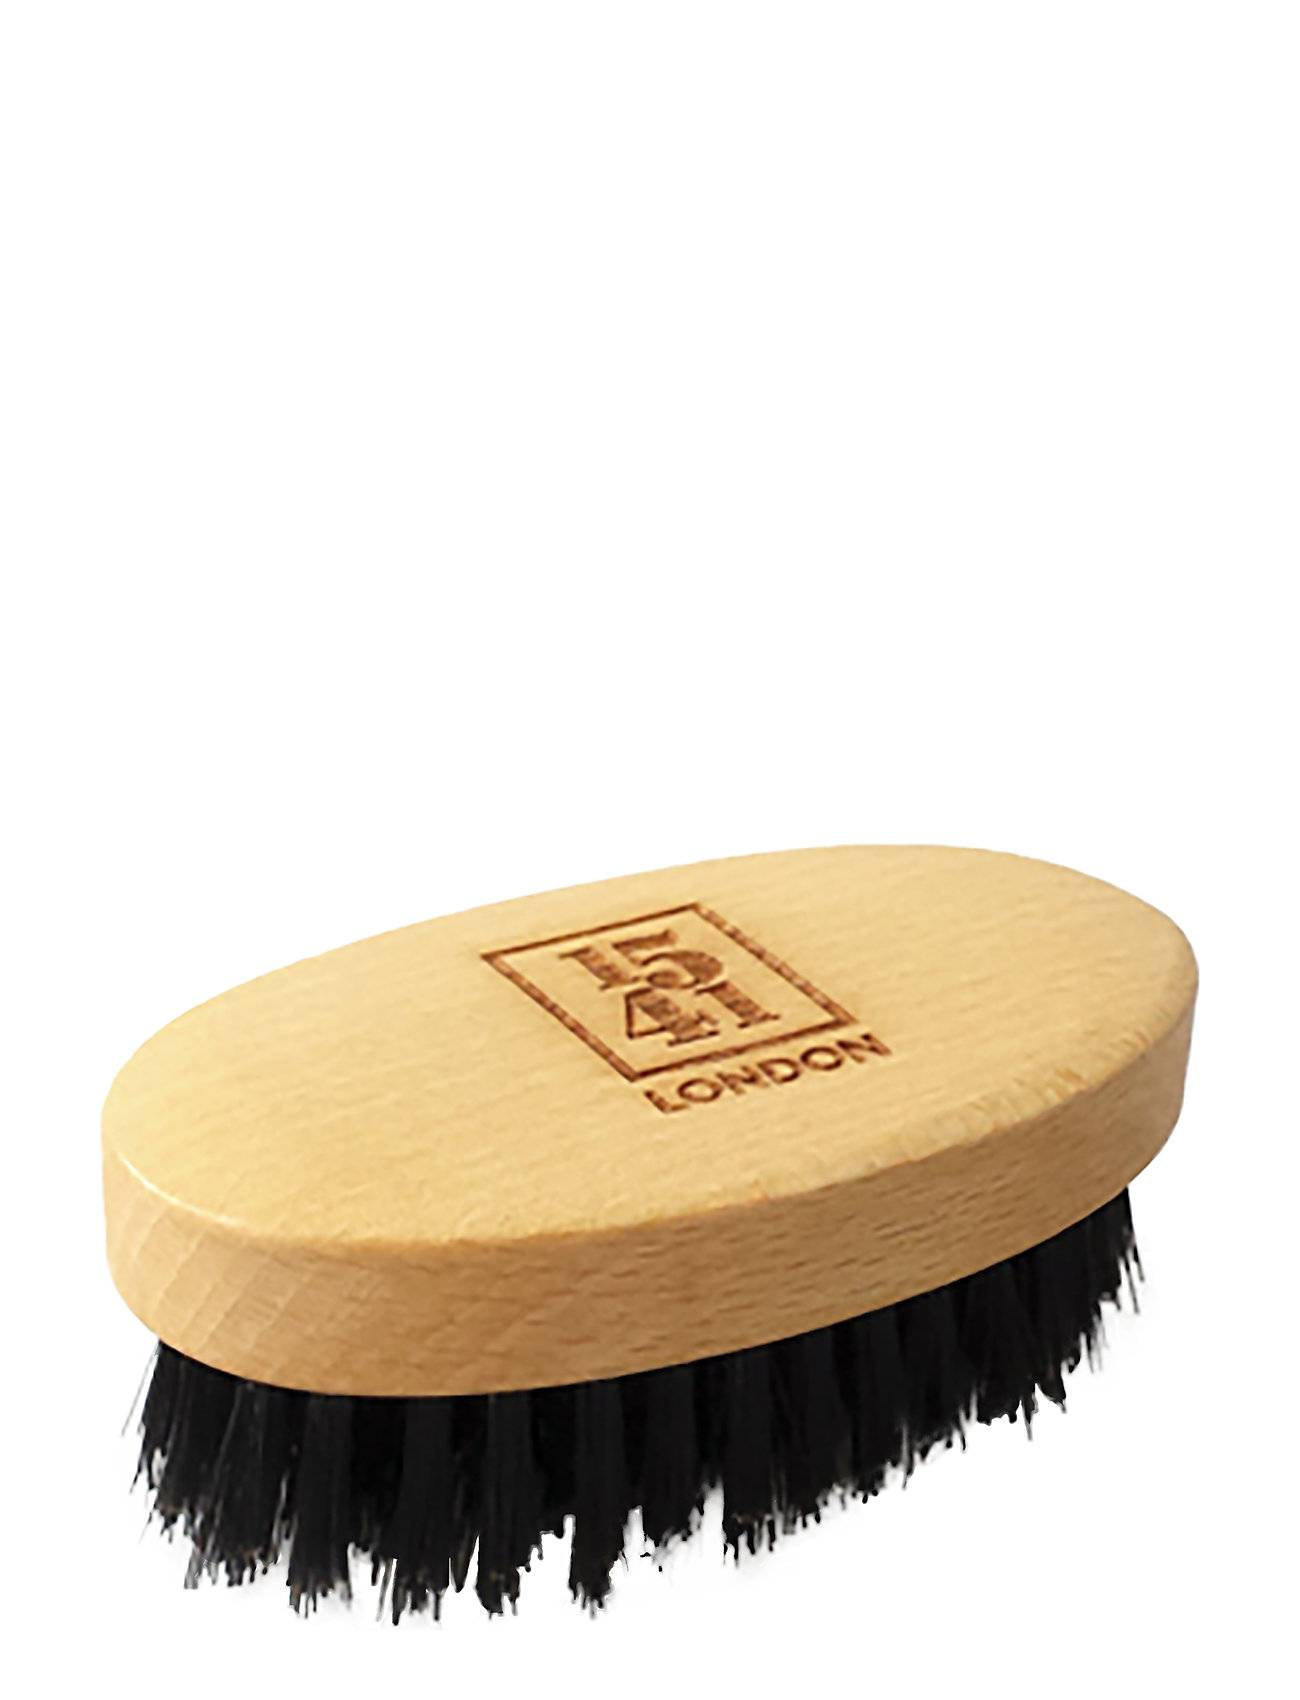 1541 of London Mini Beard & Moustache Brush Beechwood